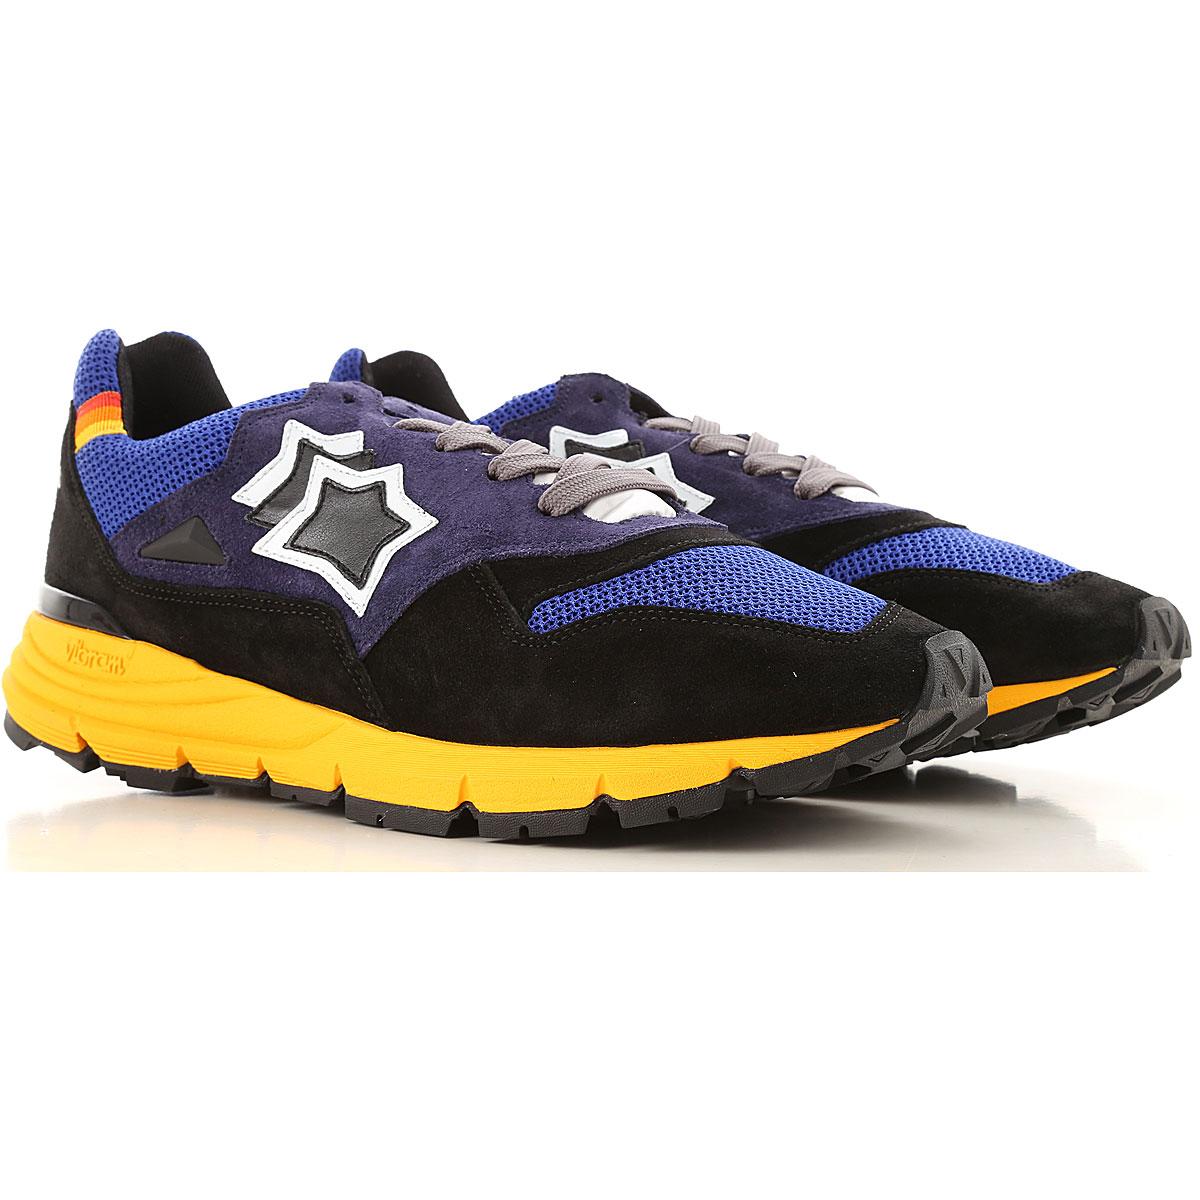 Atlantic Stars Sneakers for Men, Bluette, Leather, 2019, 10 11.5 7.5